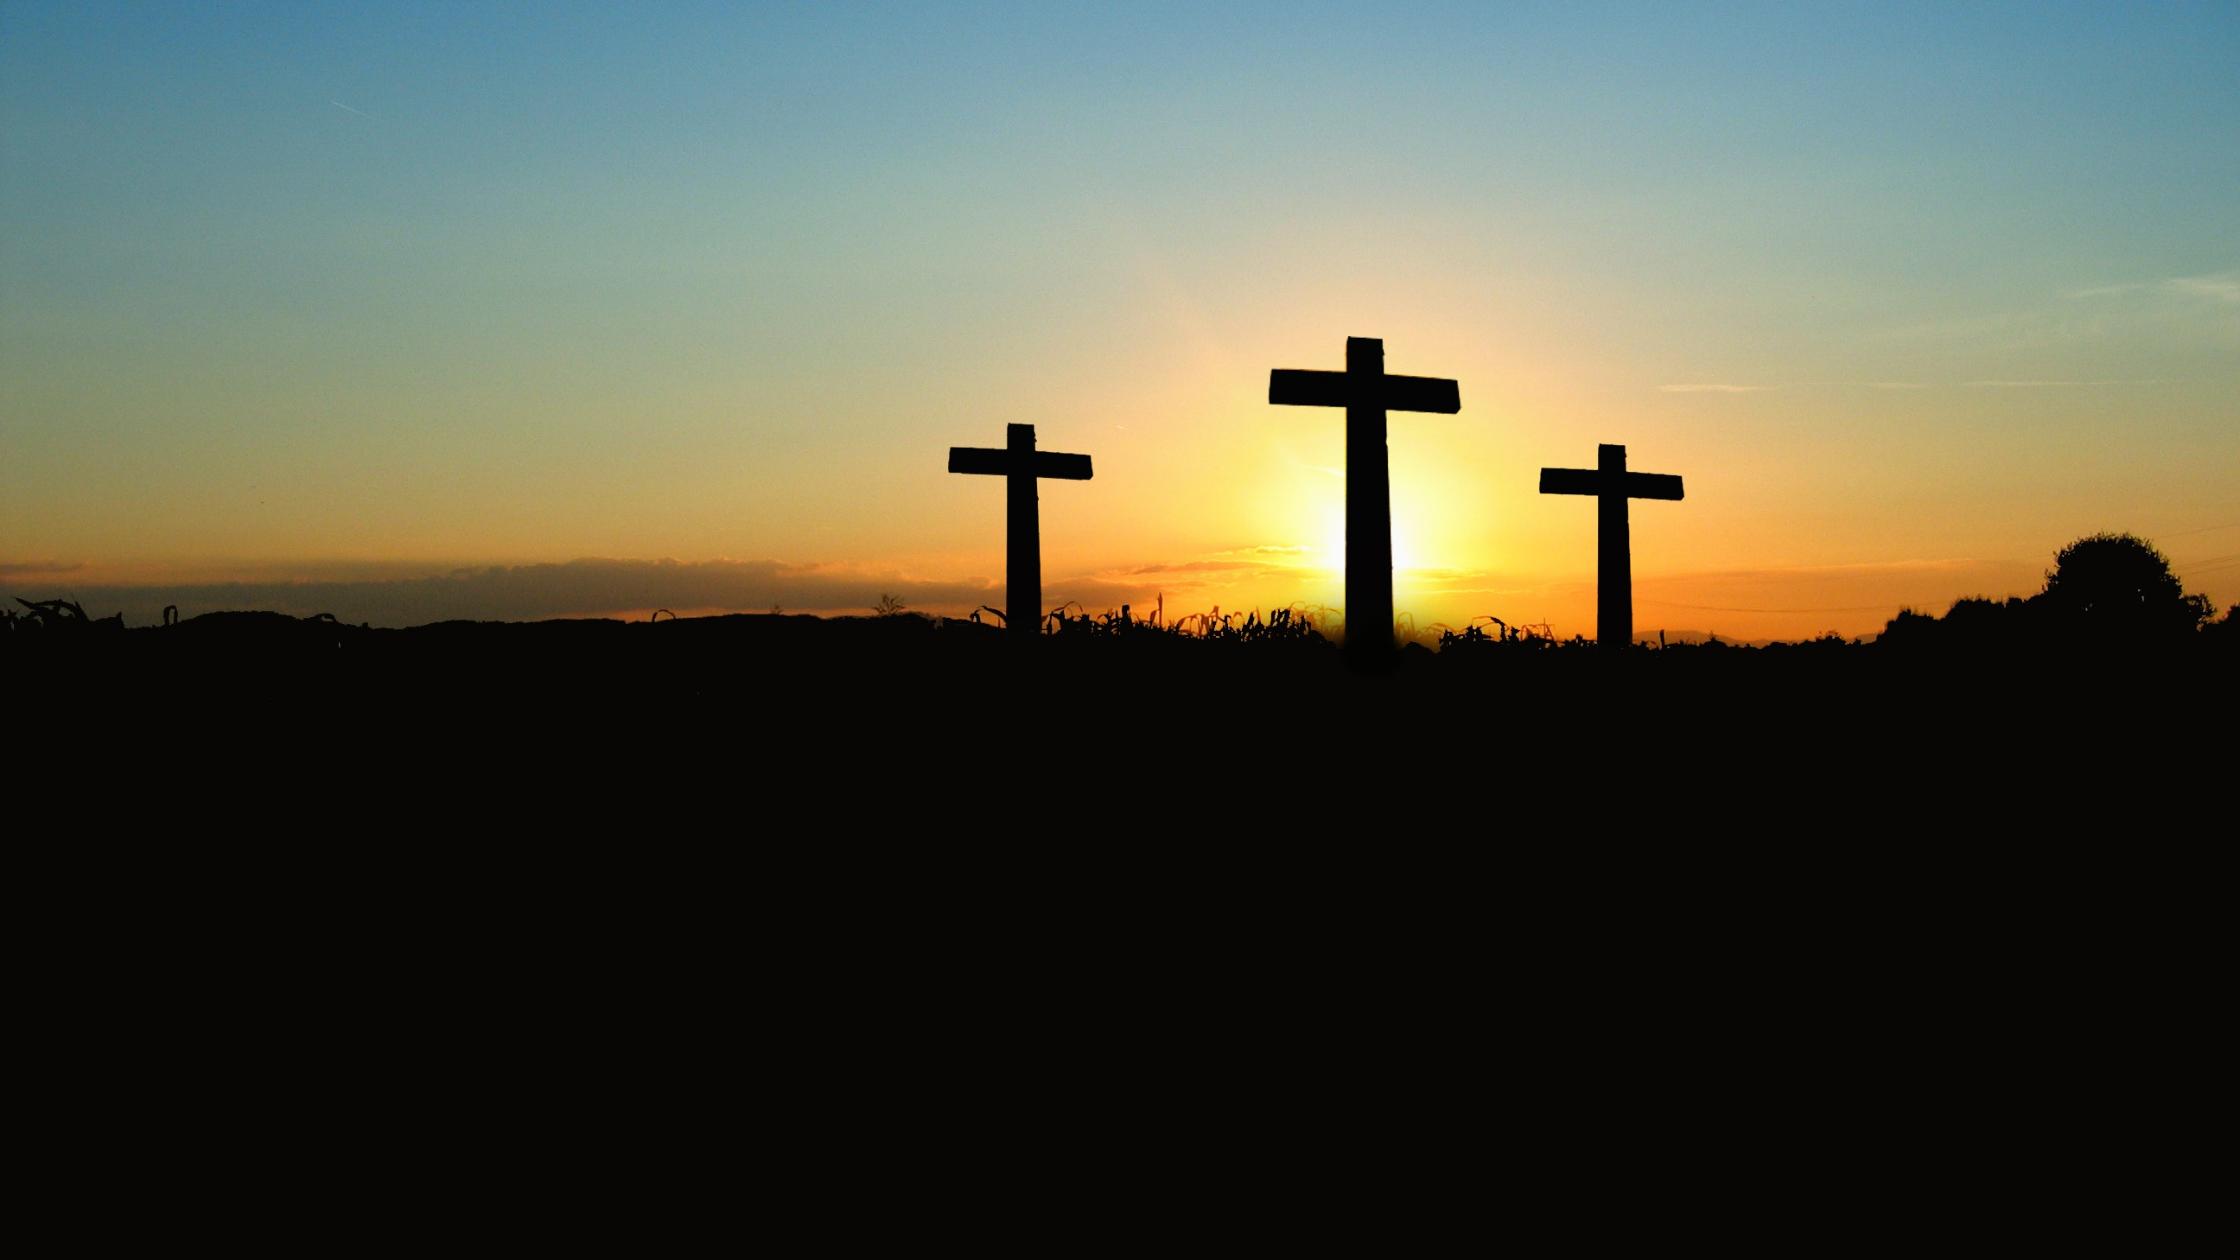 Three crosses-1